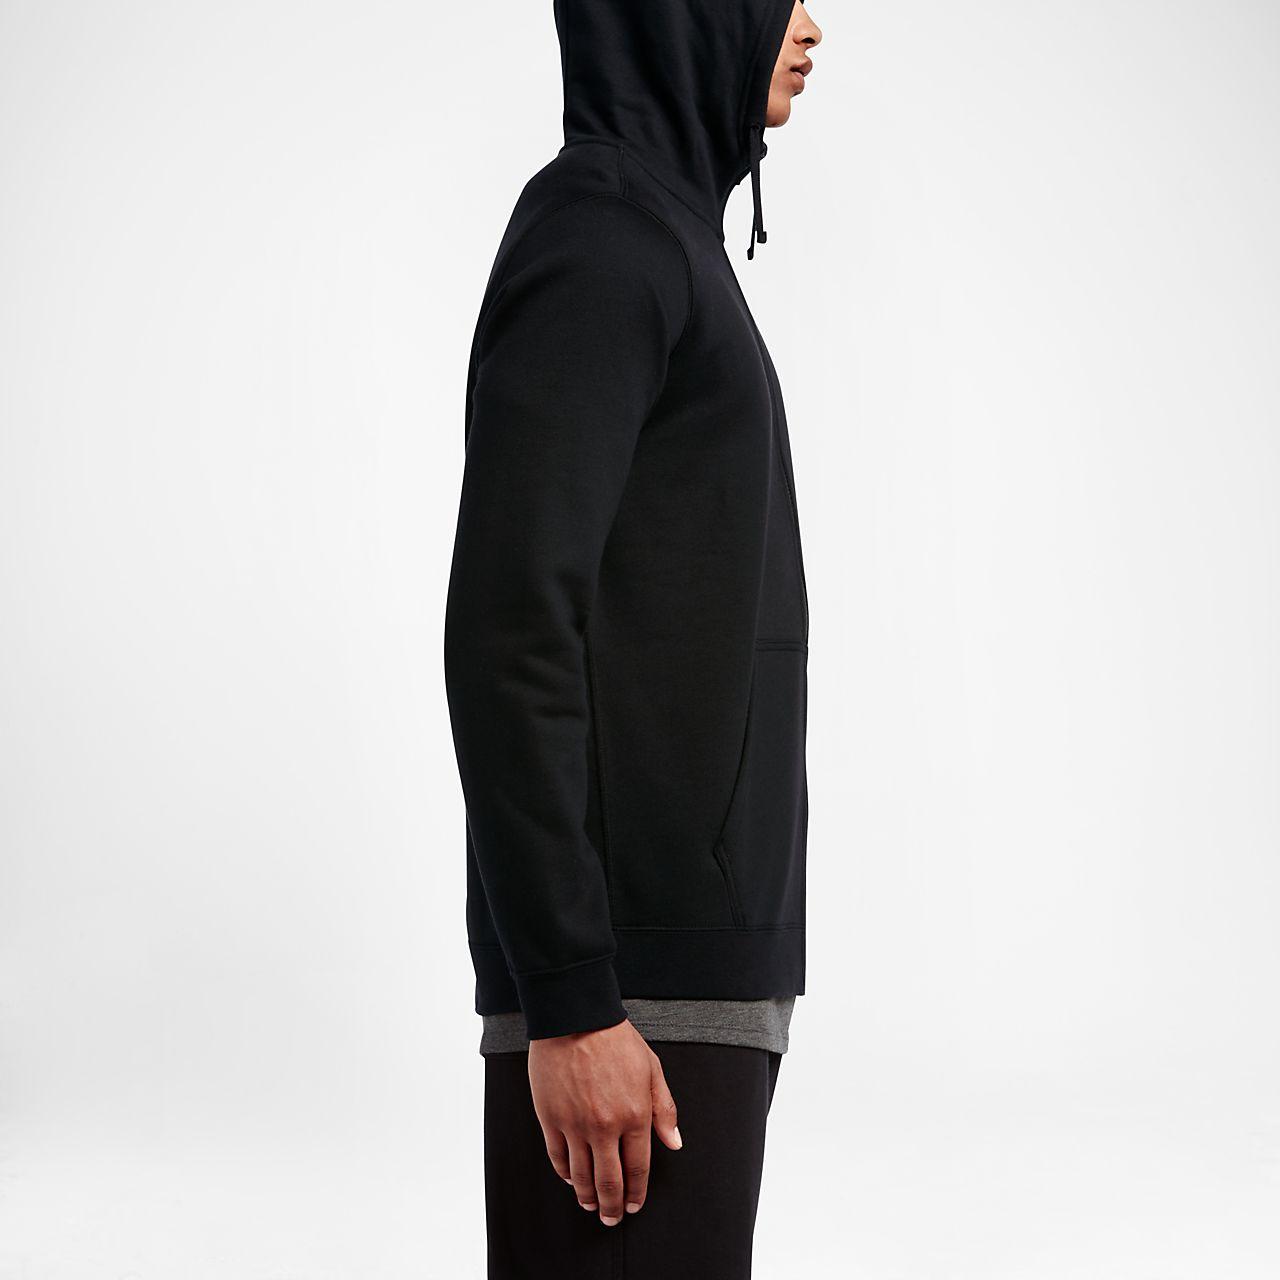 6b522417c0f9 Nike Sportswear Club Fleece Men s Hoodie. Nike.com CA